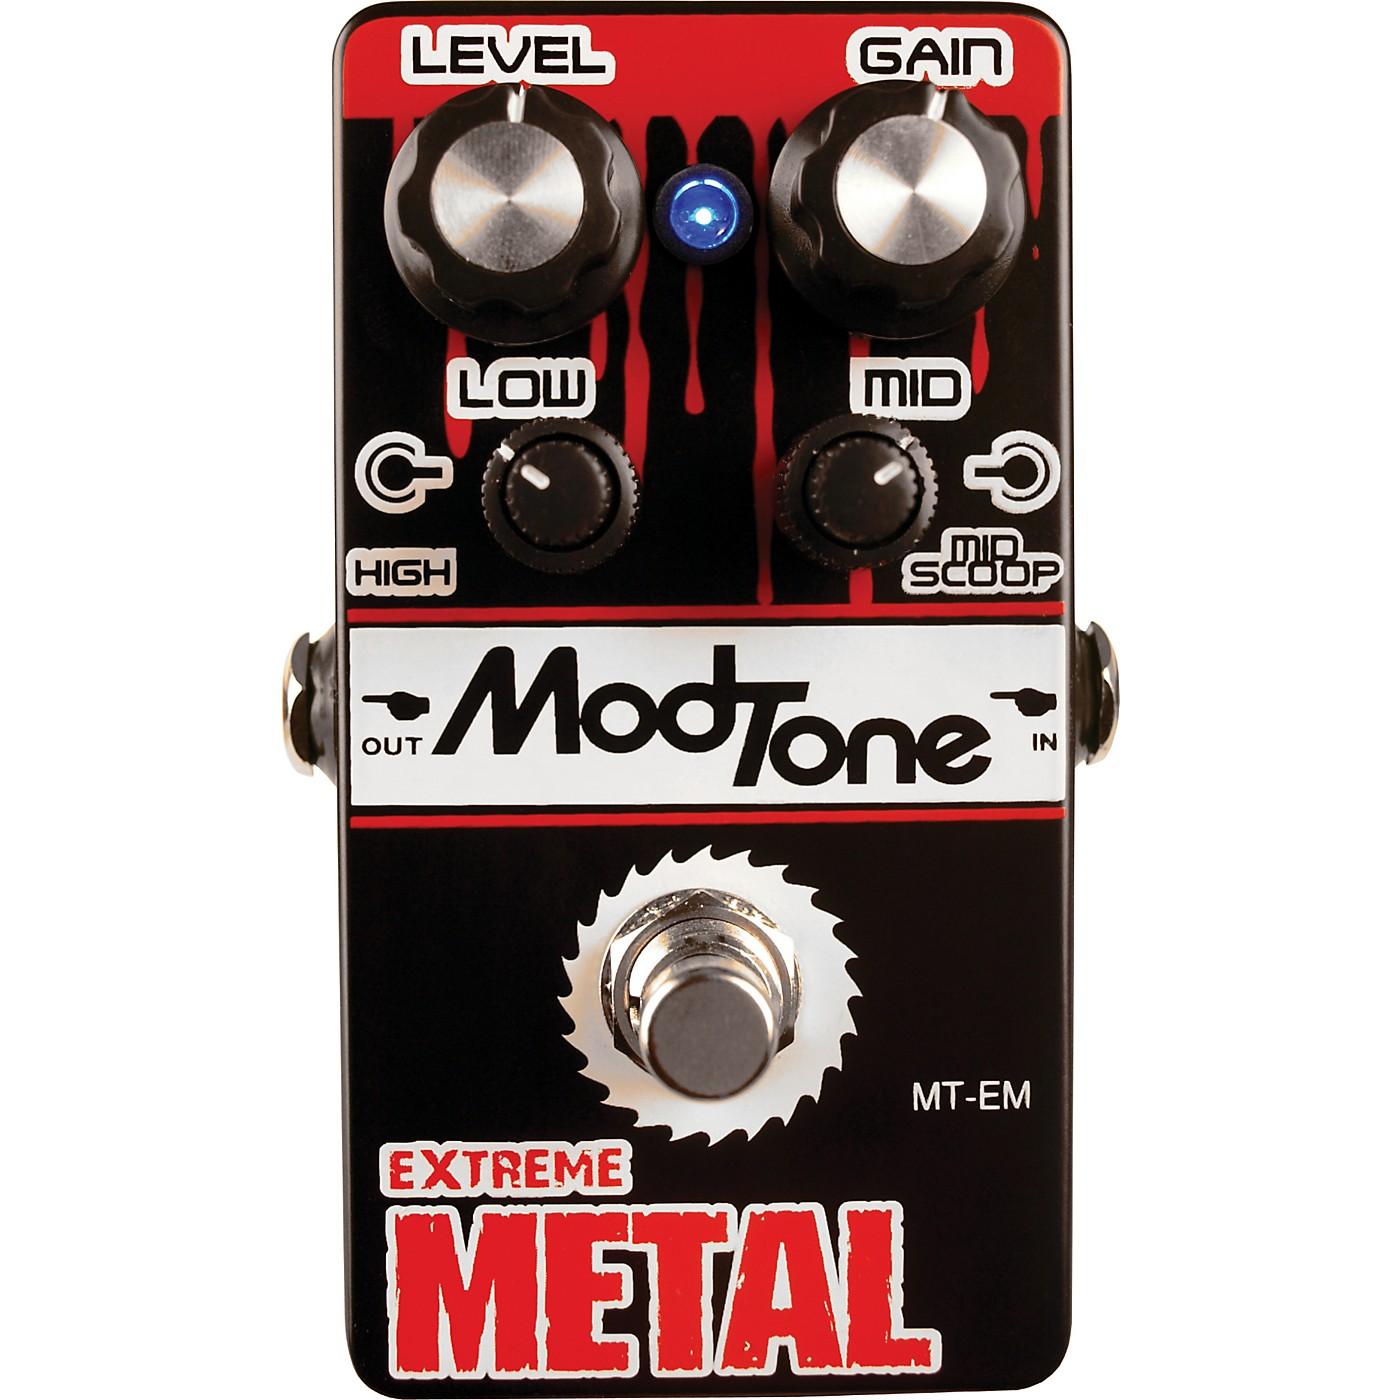 Modtone MT-EM Extreme Metal Guitar Effects Pedal thumbnail